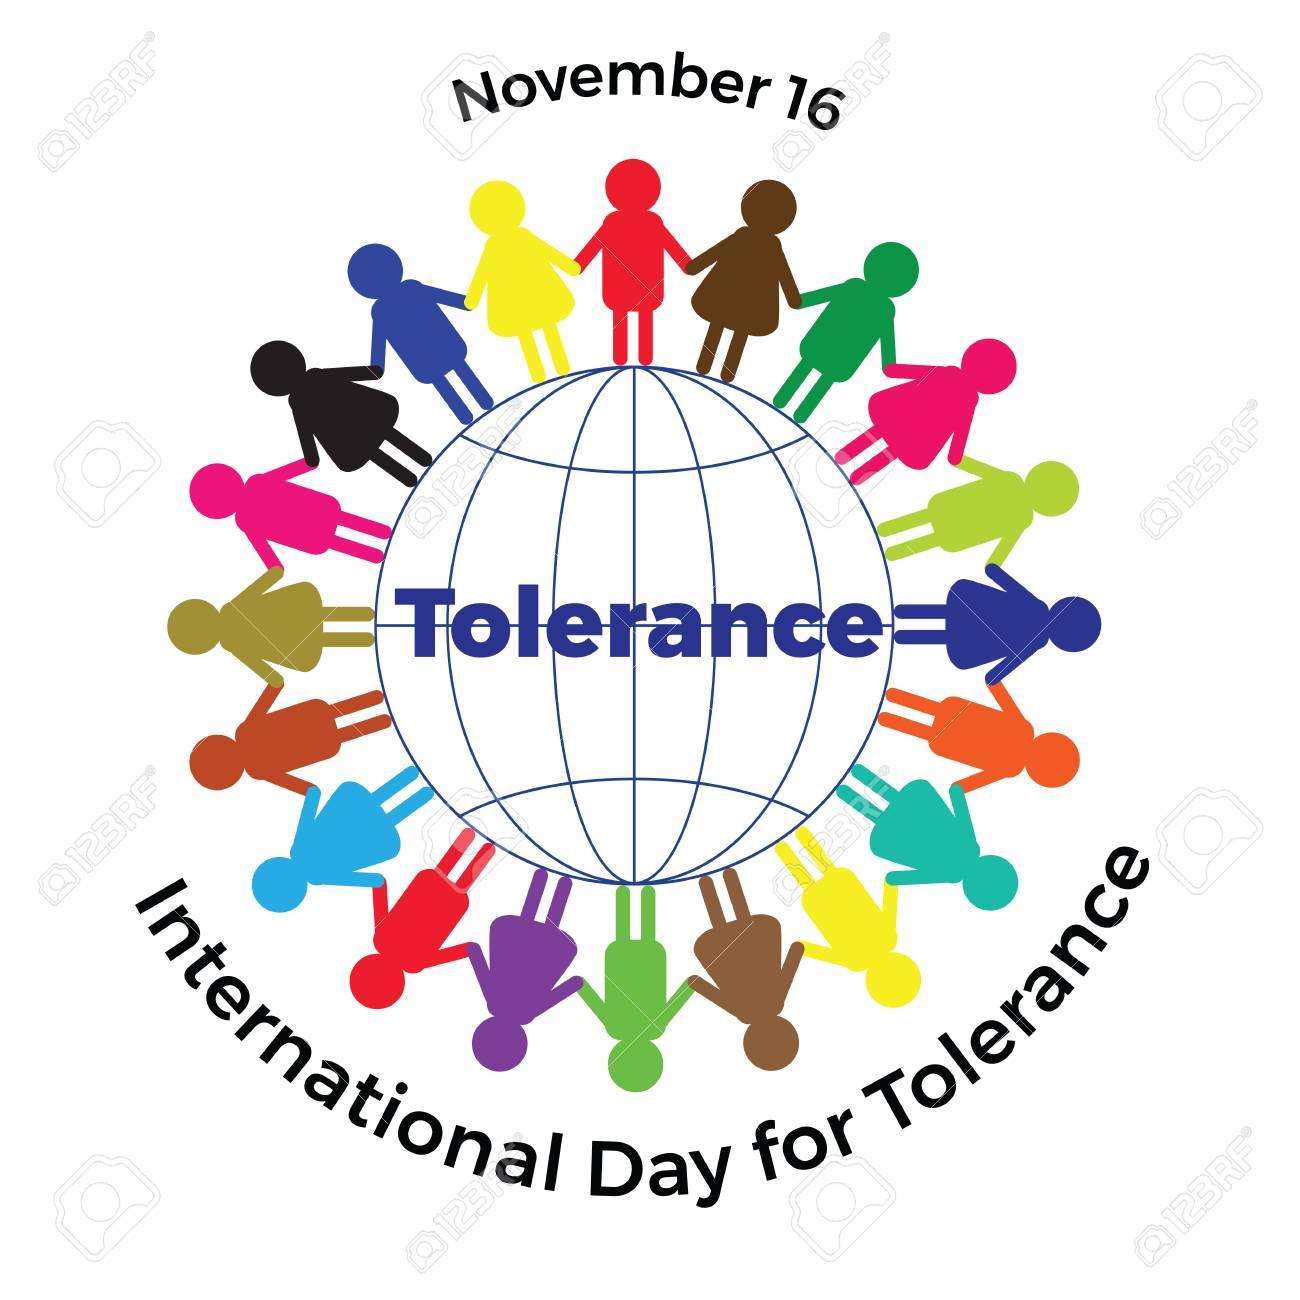 International day of tolerance illustration with colored men international day of tolerance illustration with colored men on the globe stock vector 89520533 biocorpaavc Image collections